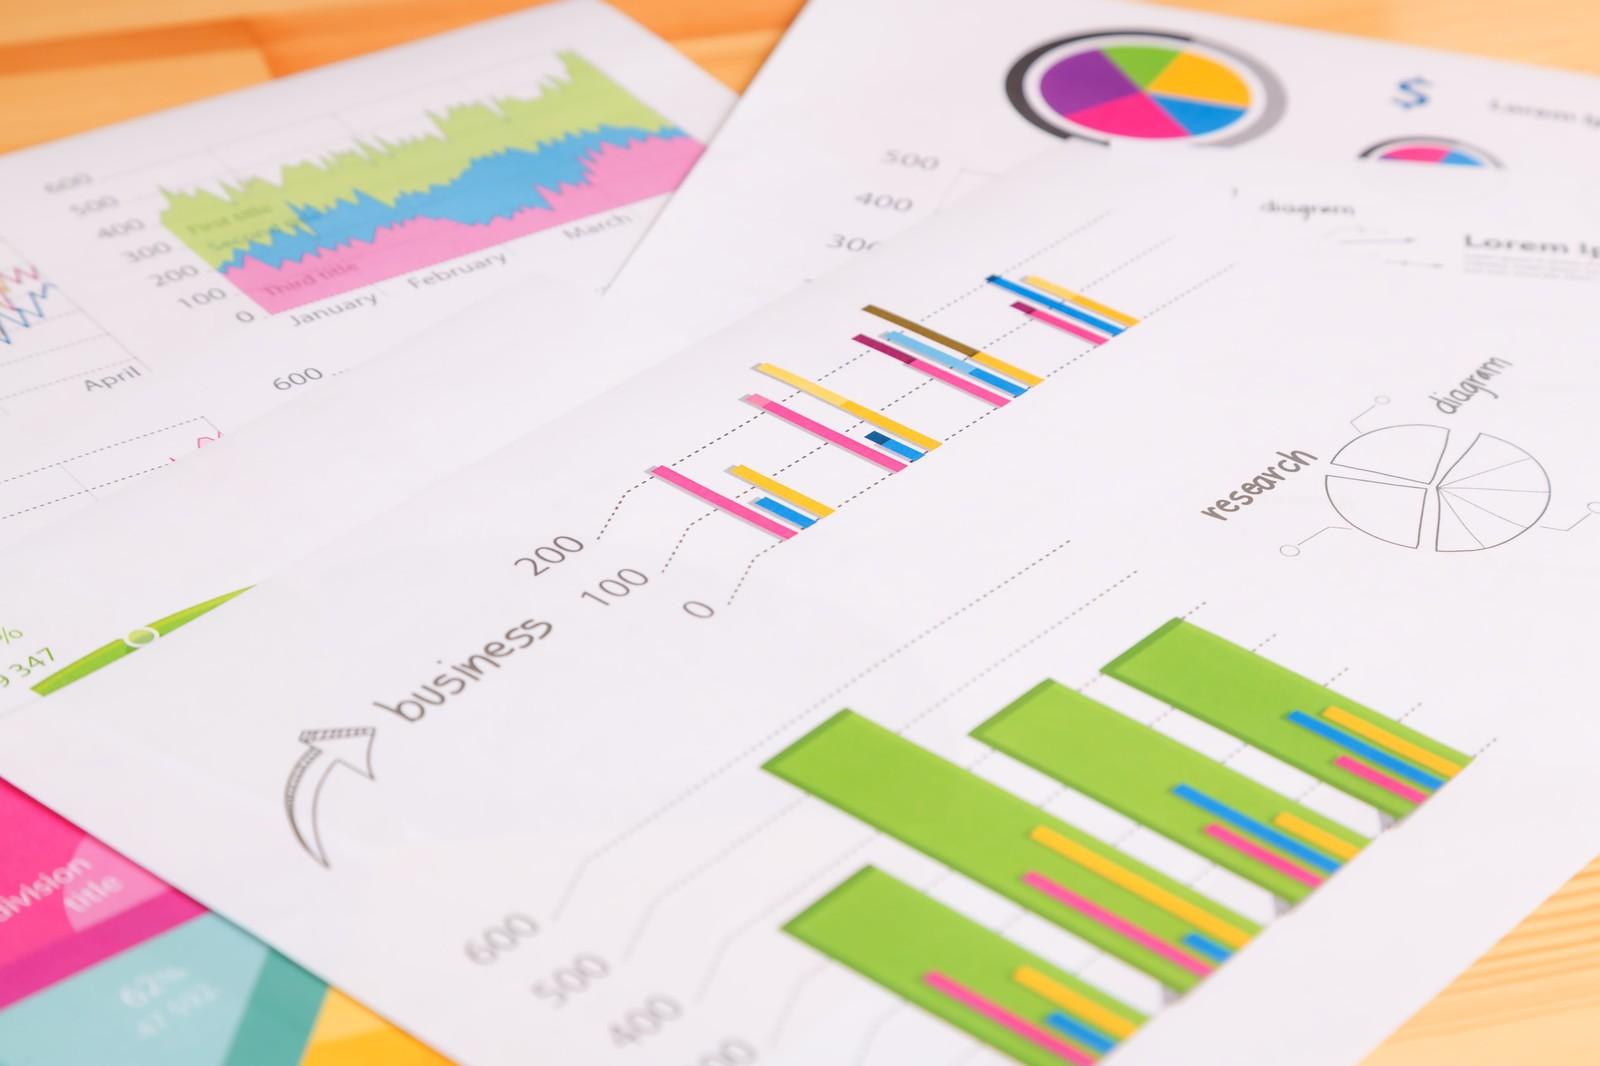 WEBの行動情報を解析するマーケティングオートメーションツール